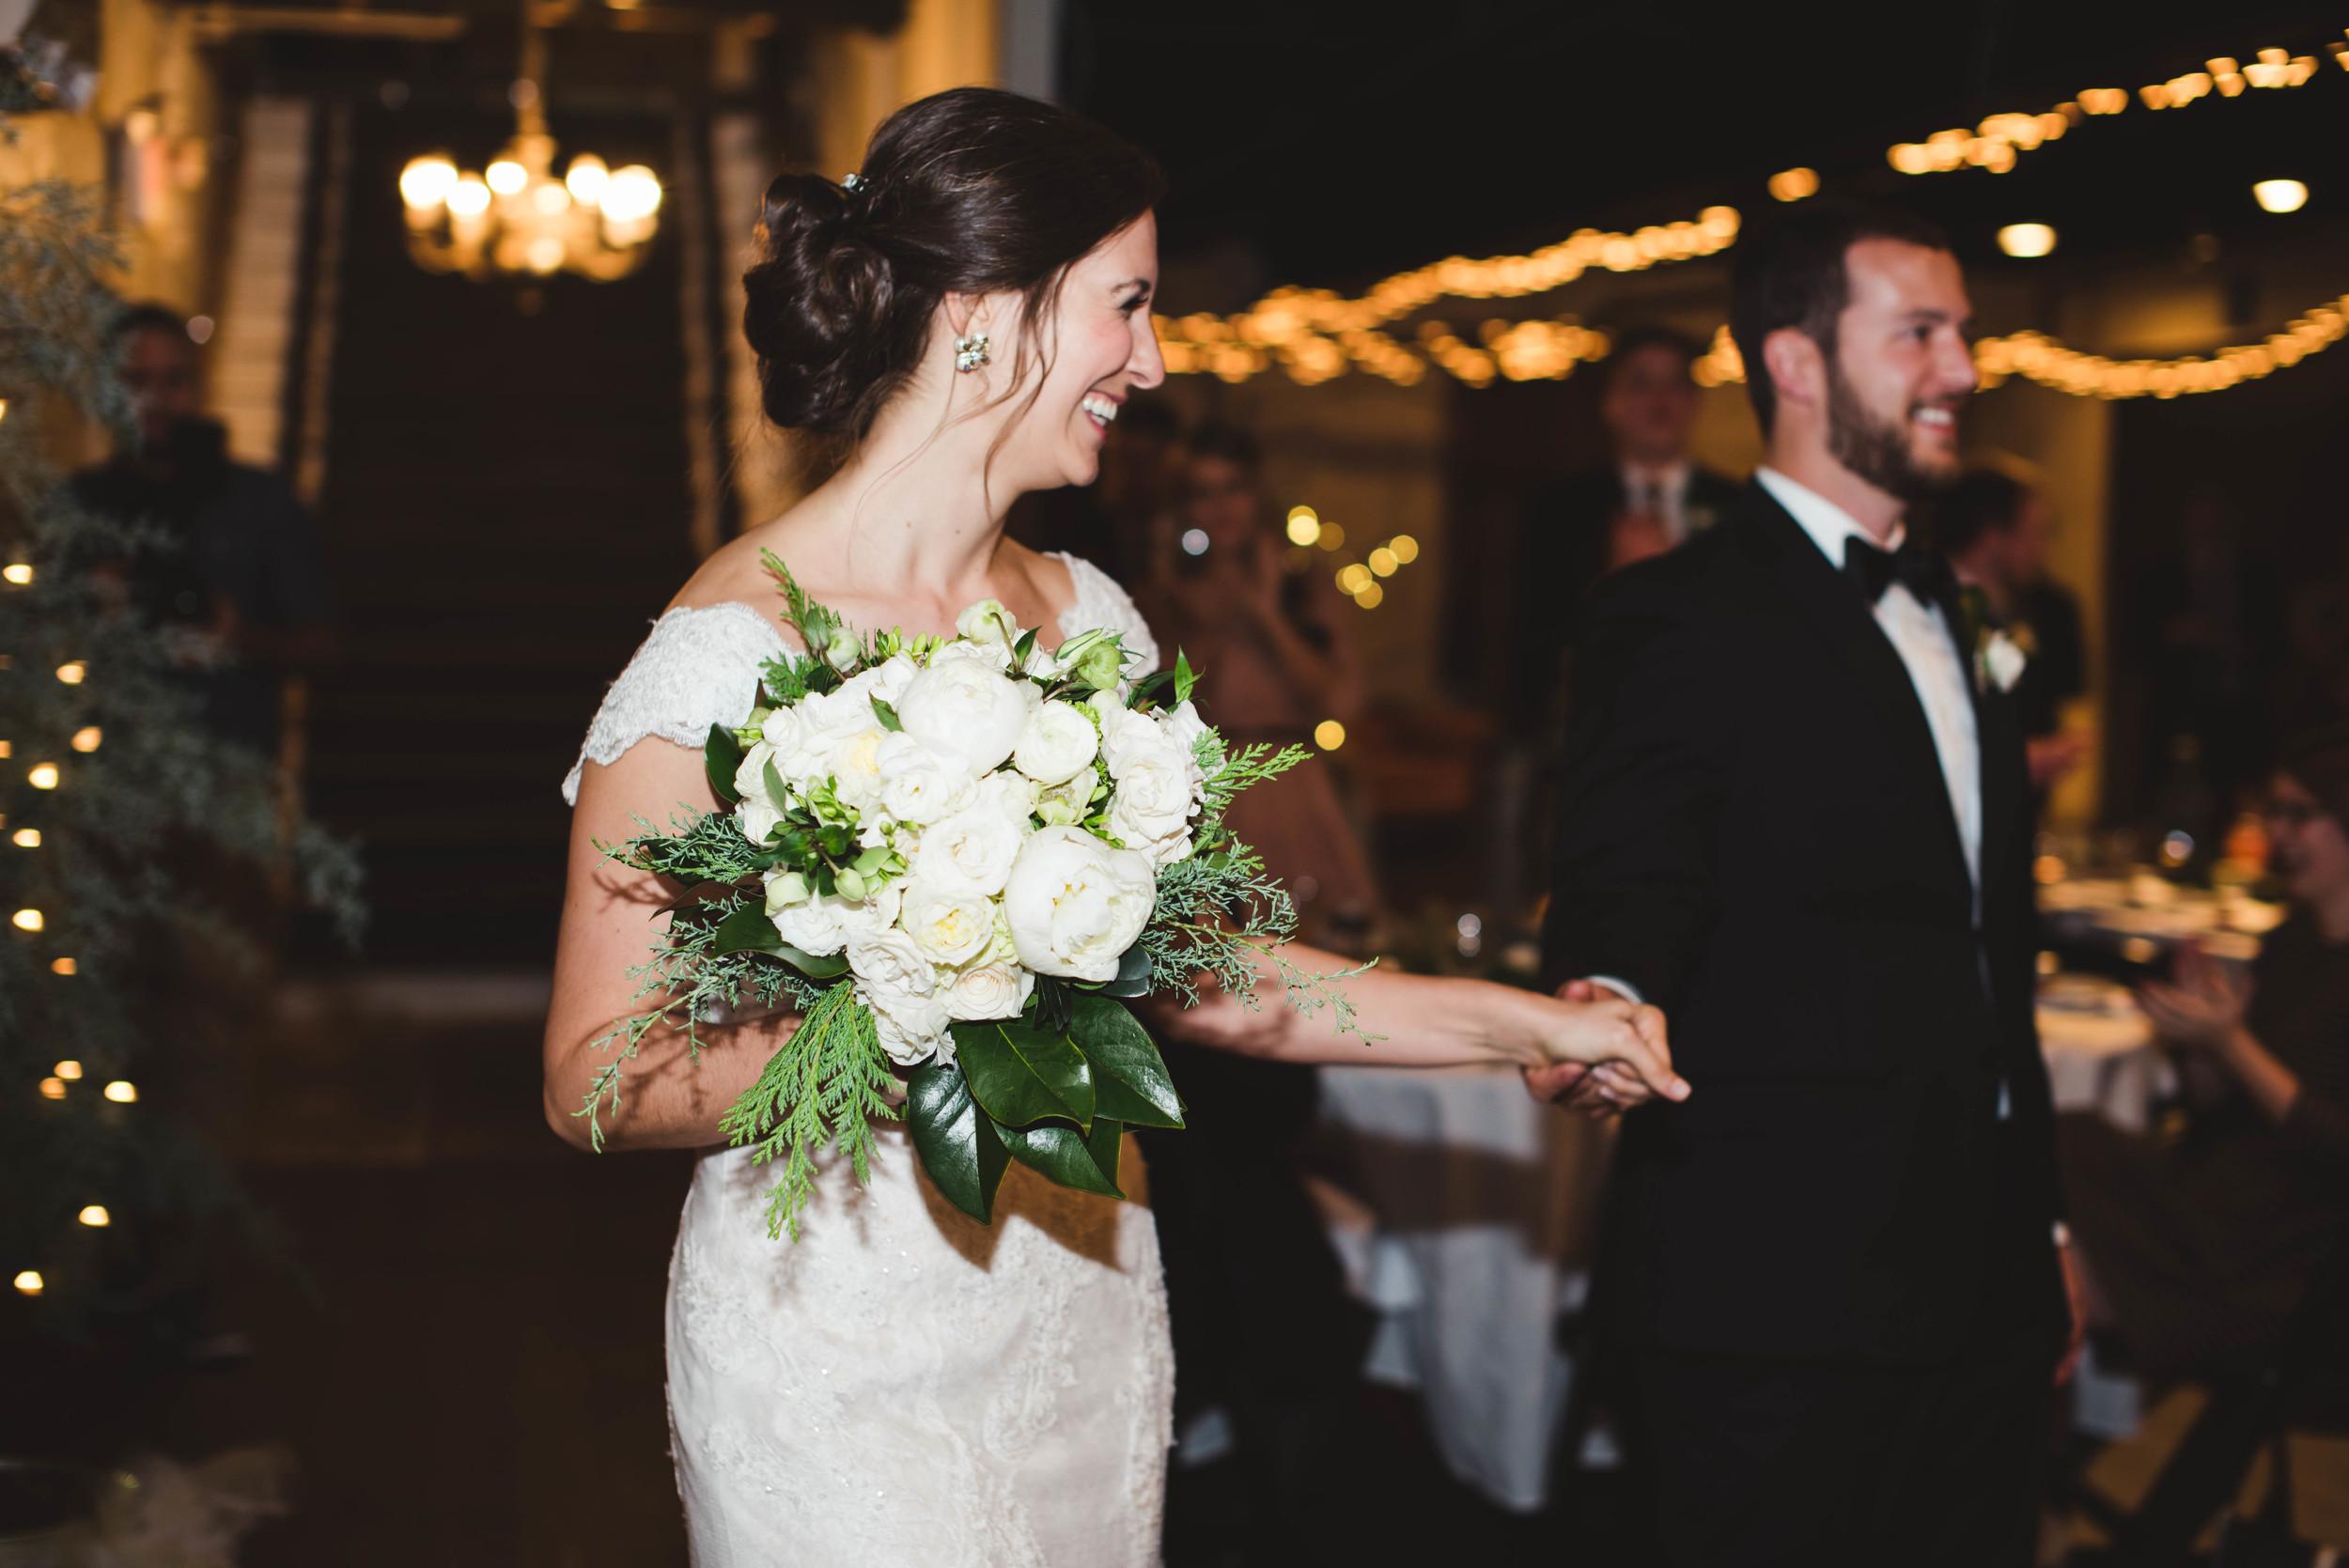 Souther wedding-6.jpg